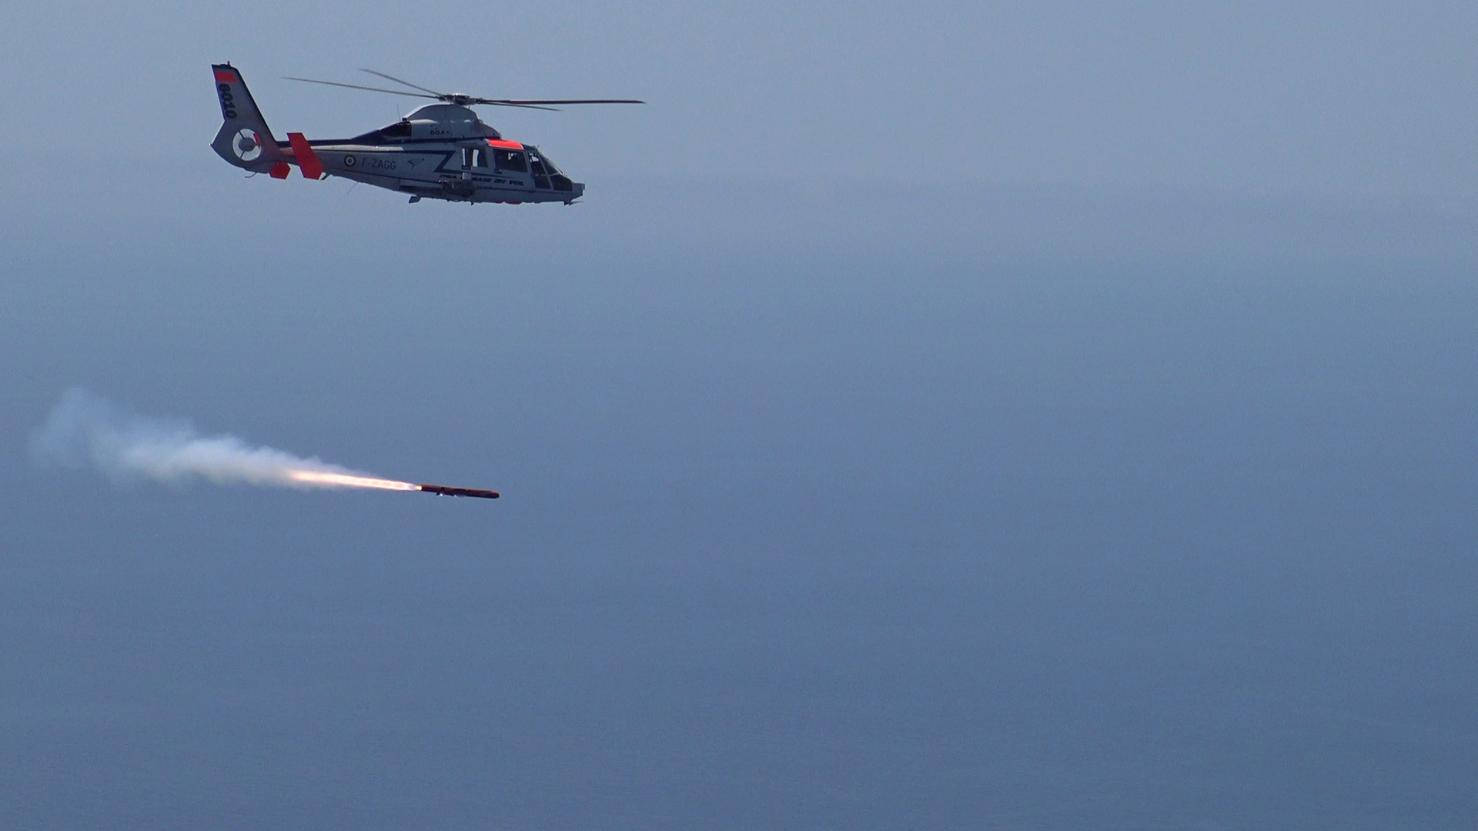 Third test firing for MBDA Sea Venom missile